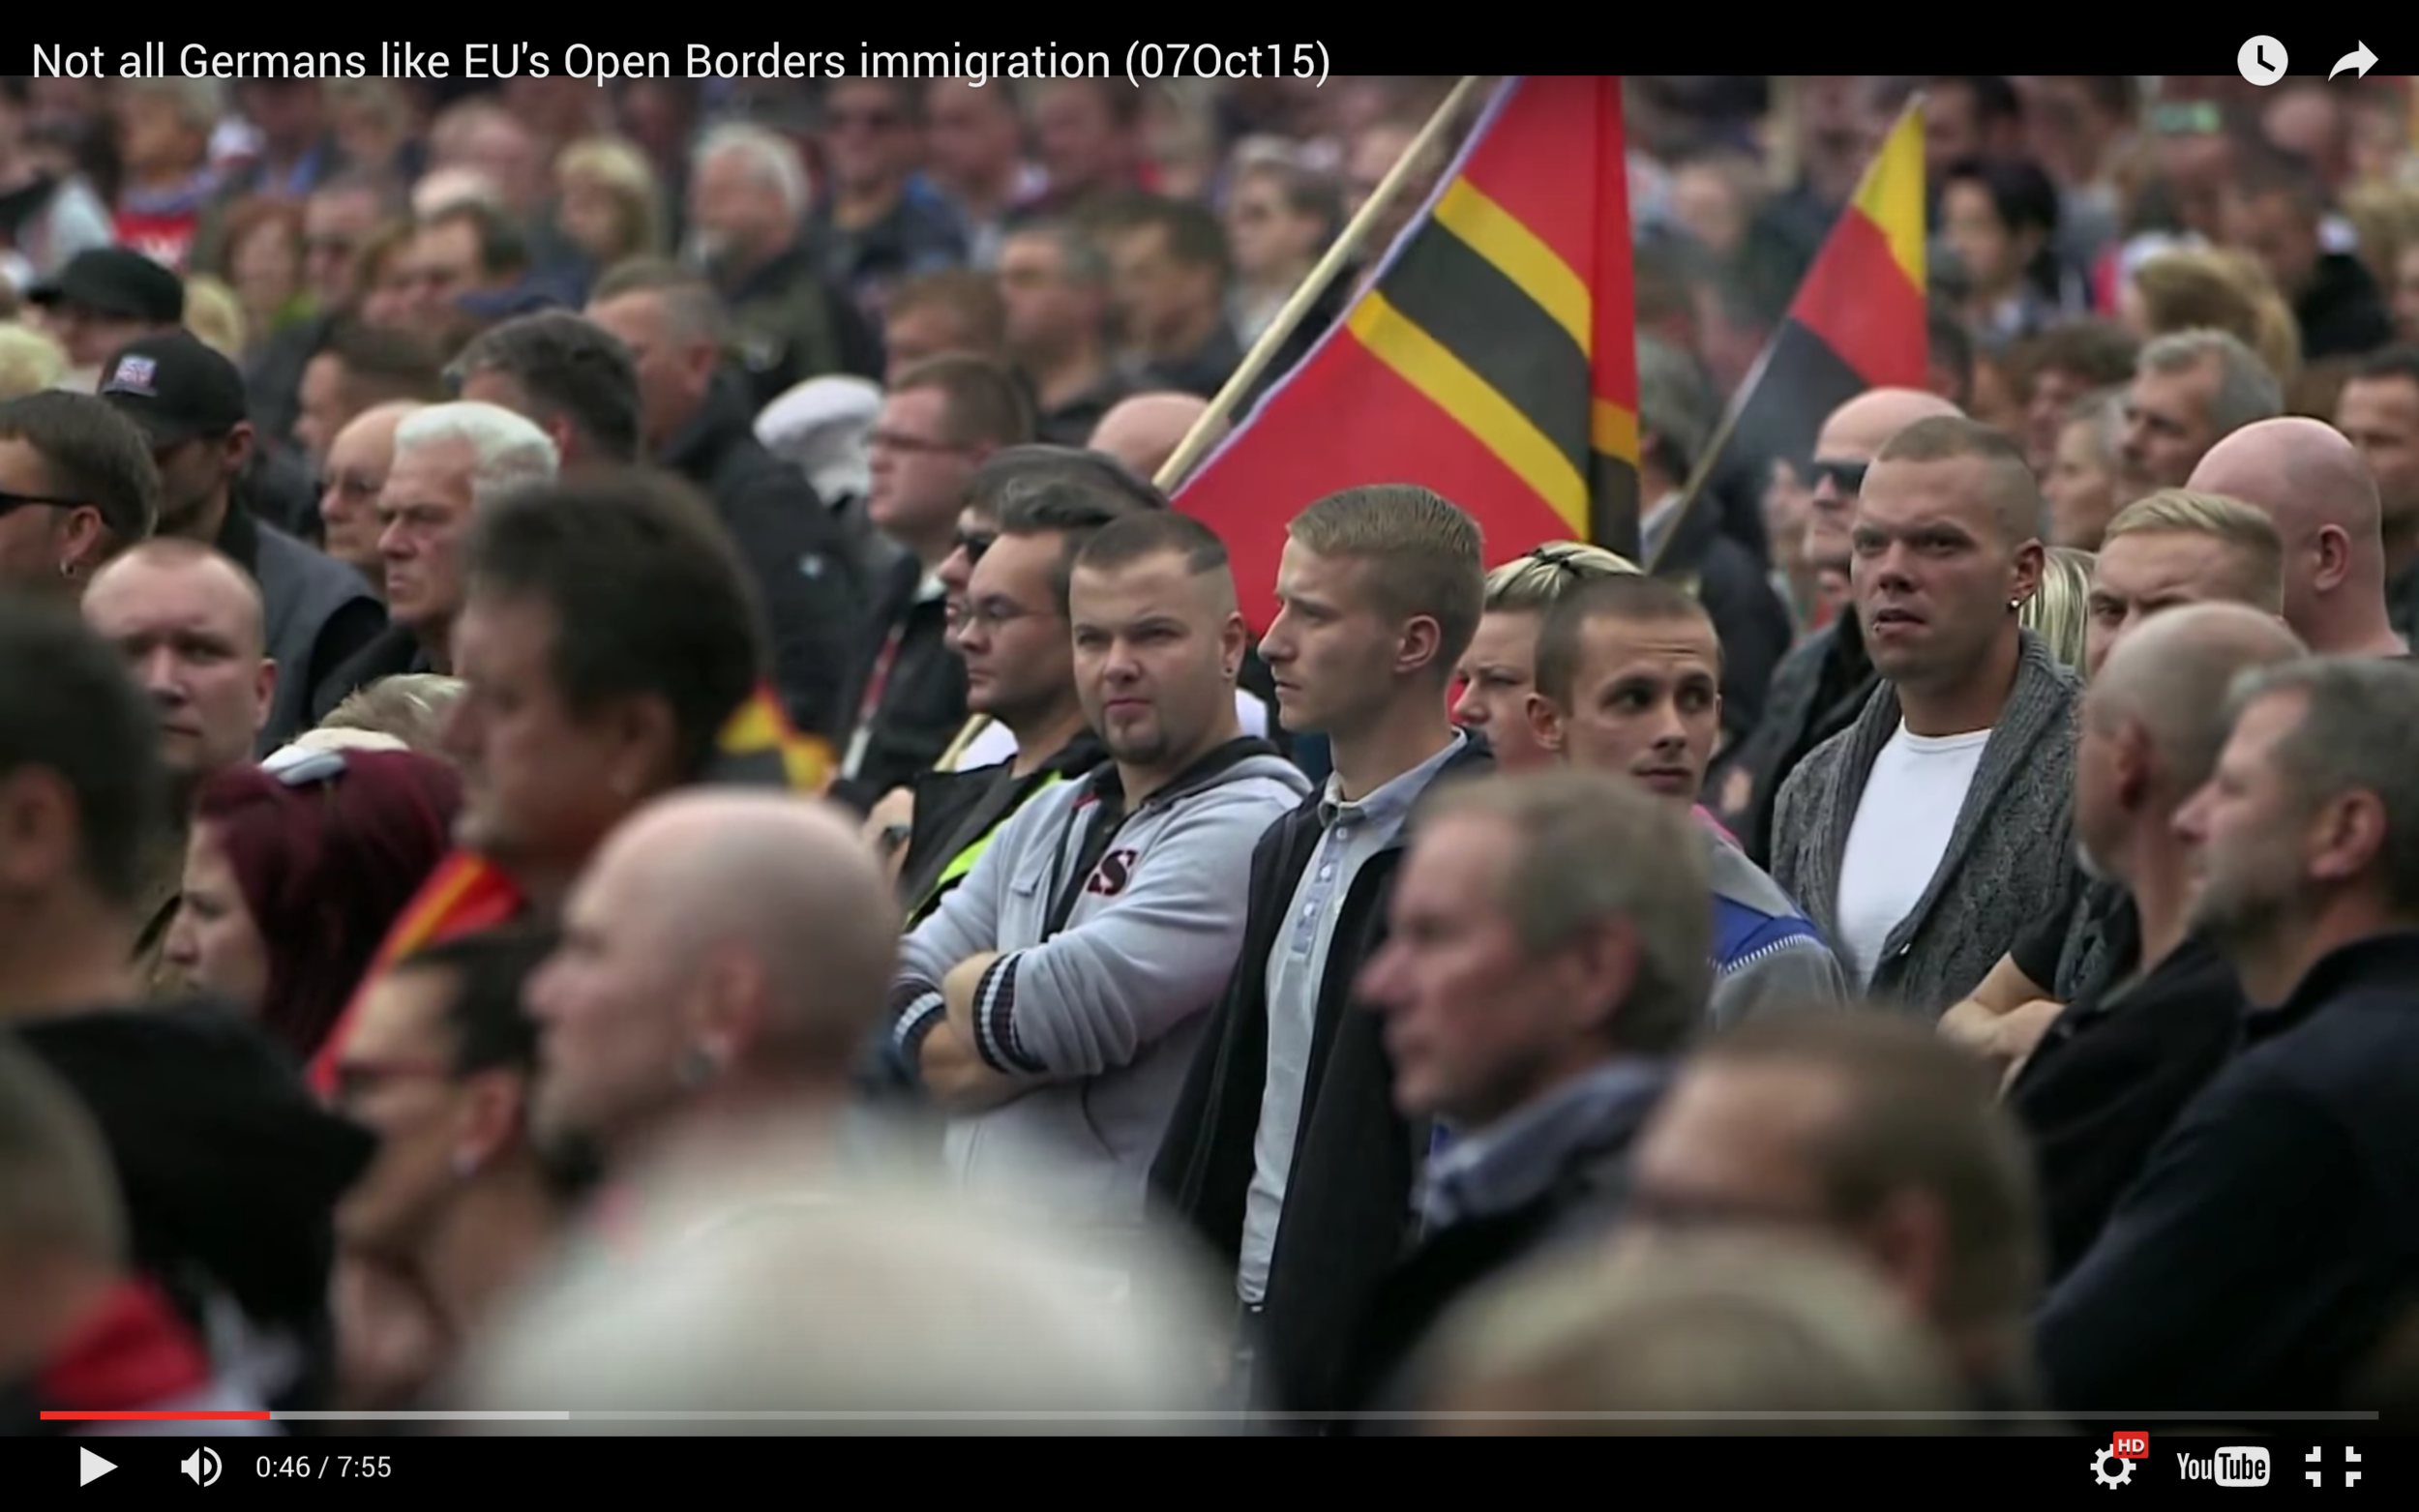 Not All Germans Like EU's Open Borders (Video)